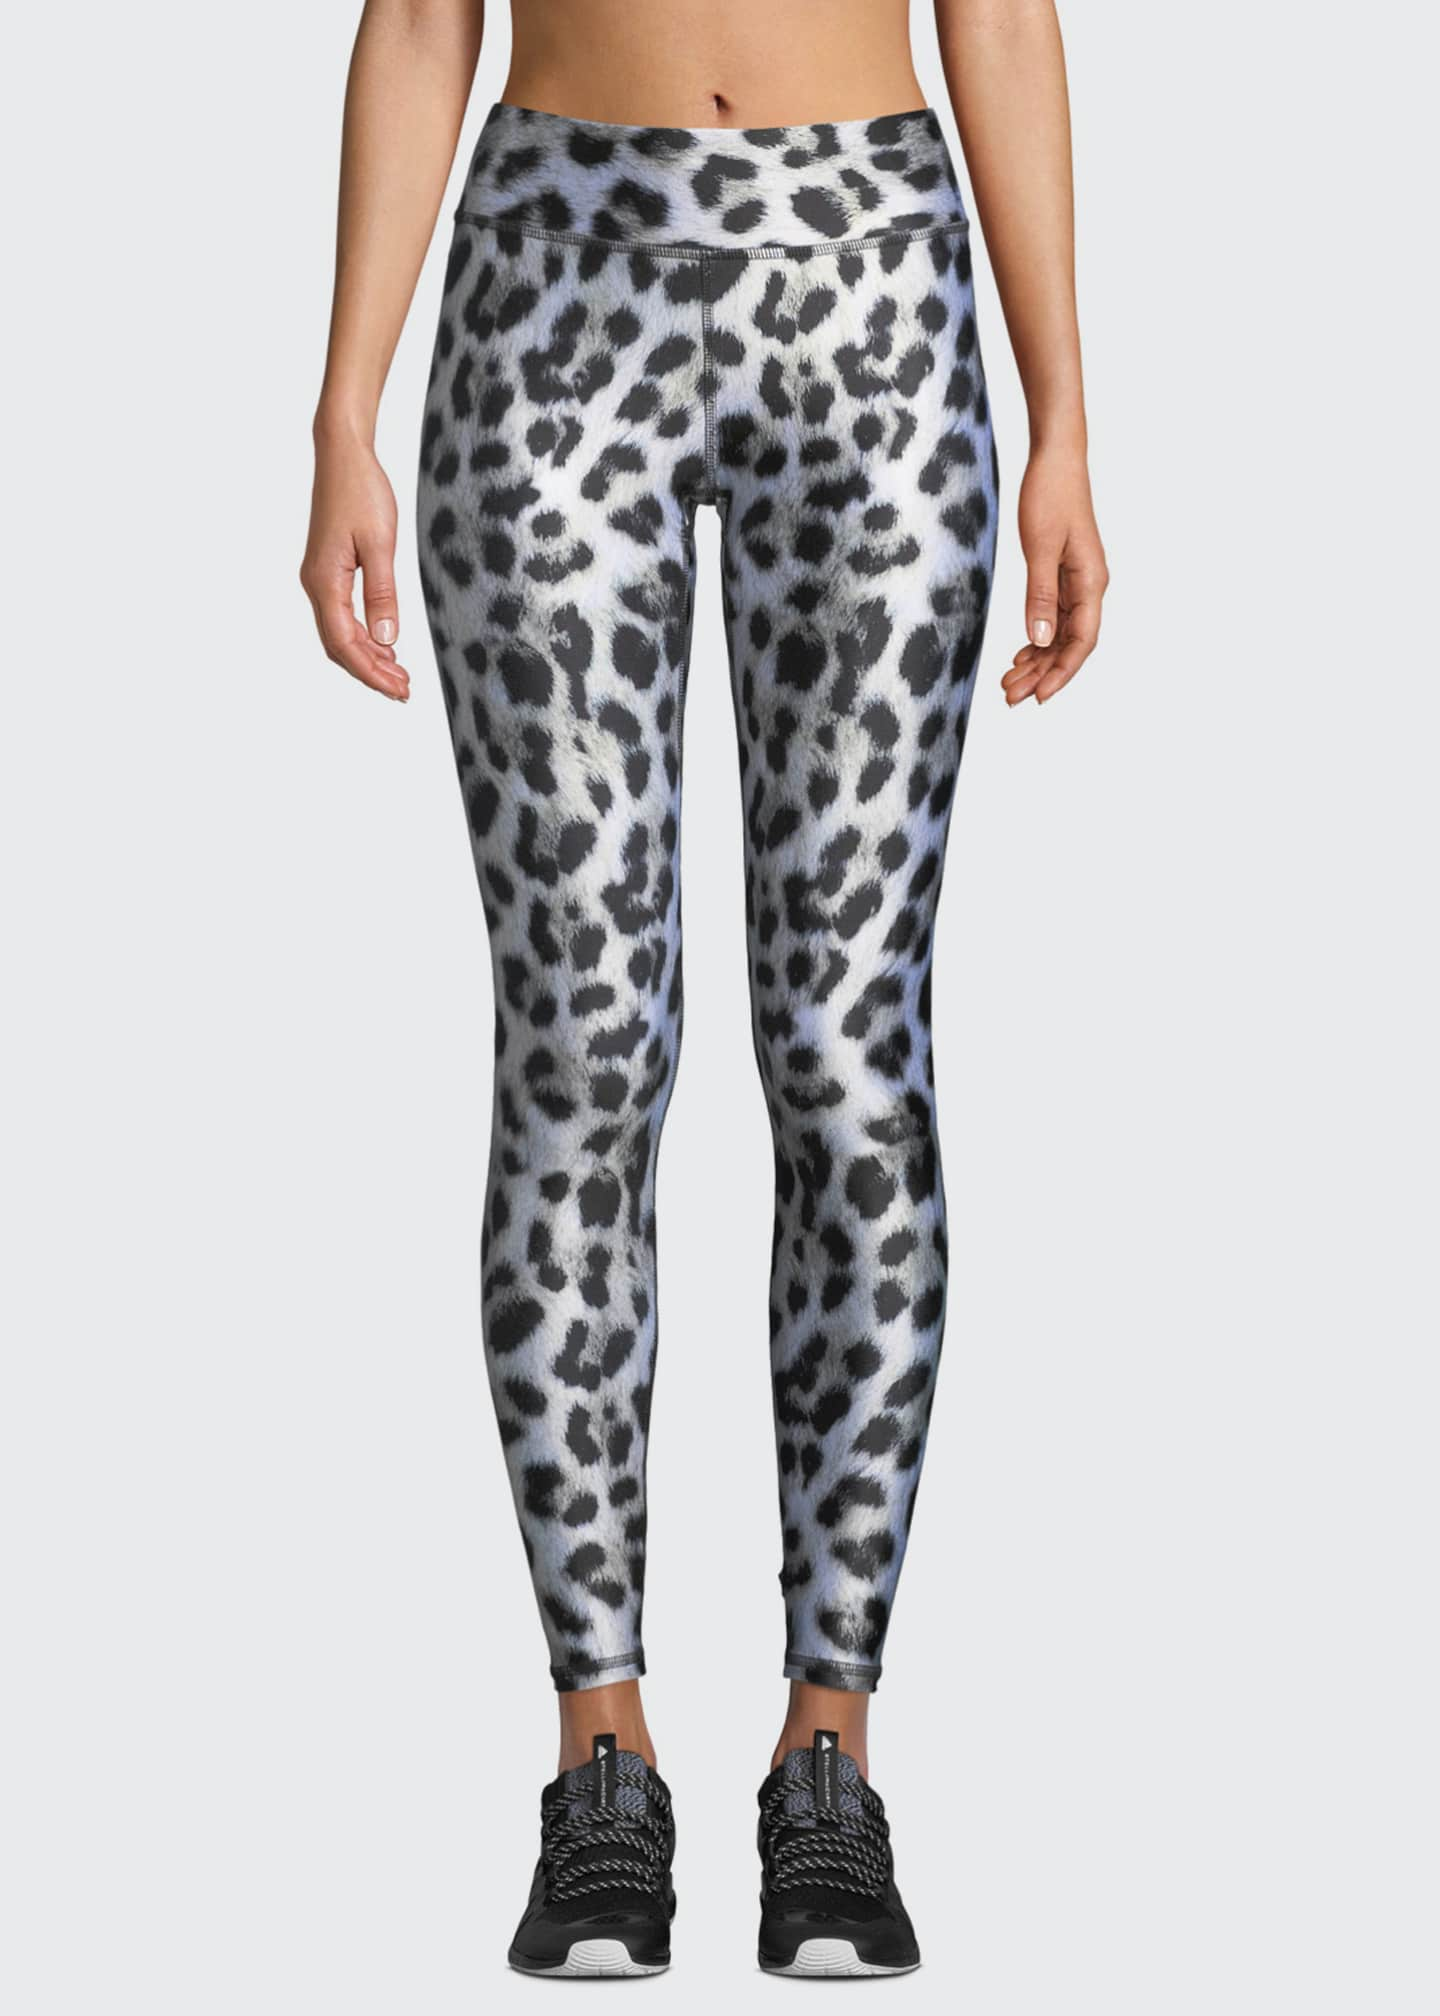 Terez Leopard-Print Tall Band Performance Leggings